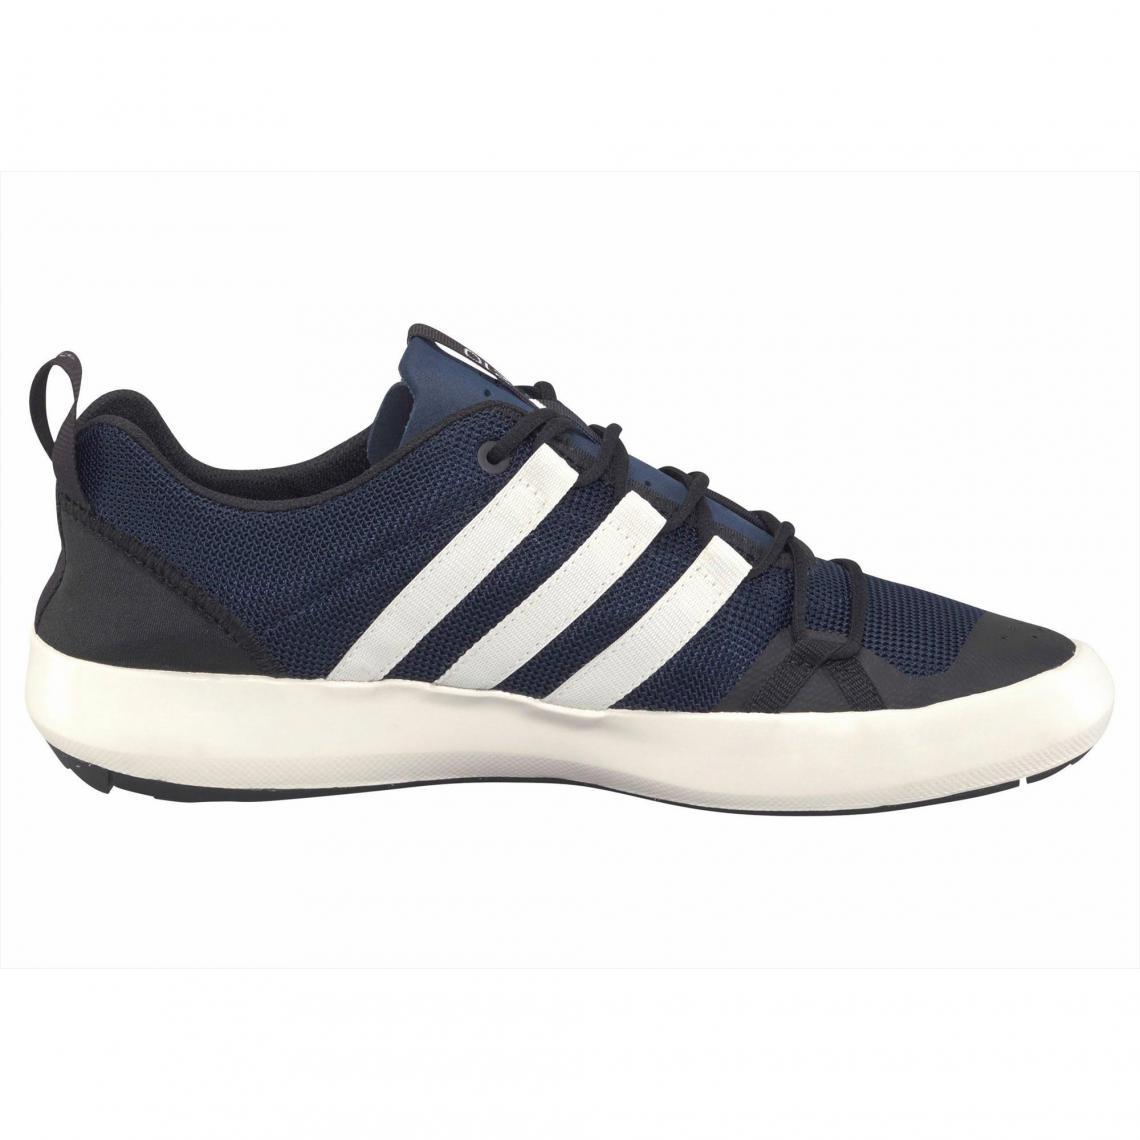 adidas Freefootball x ite NoirBlancOrange